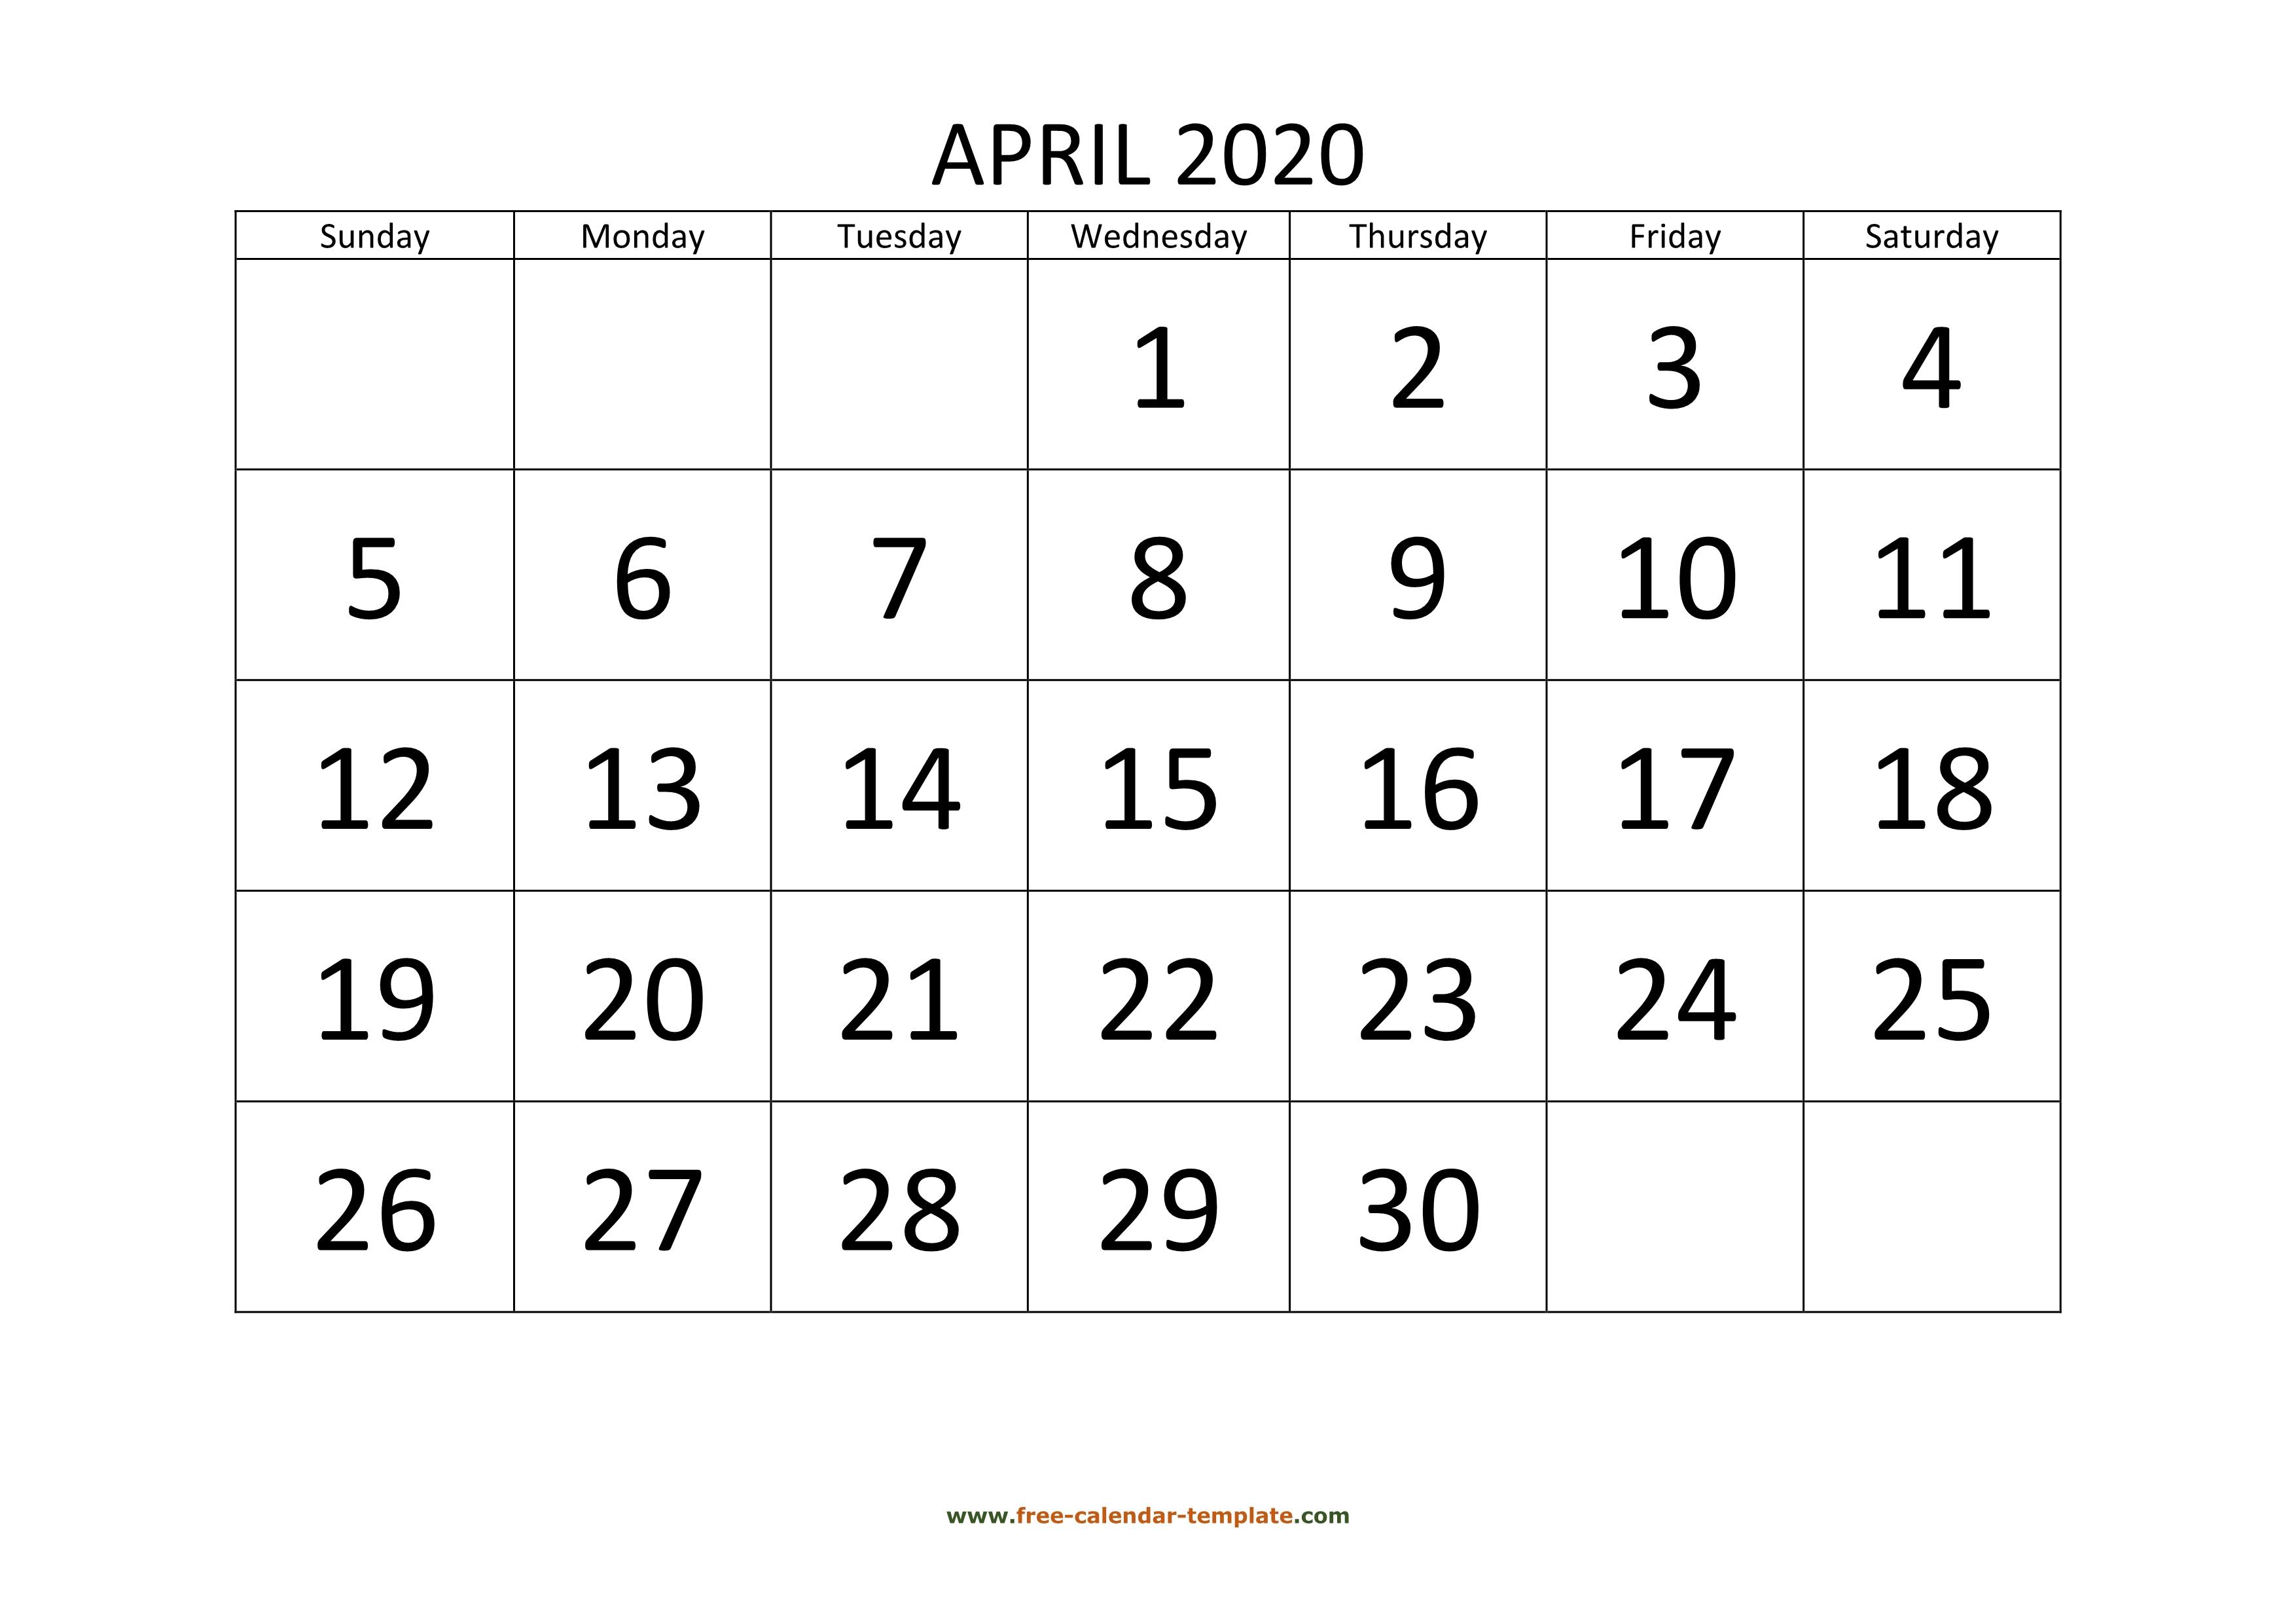 April Calendar Template from www.free-calendar-template.com